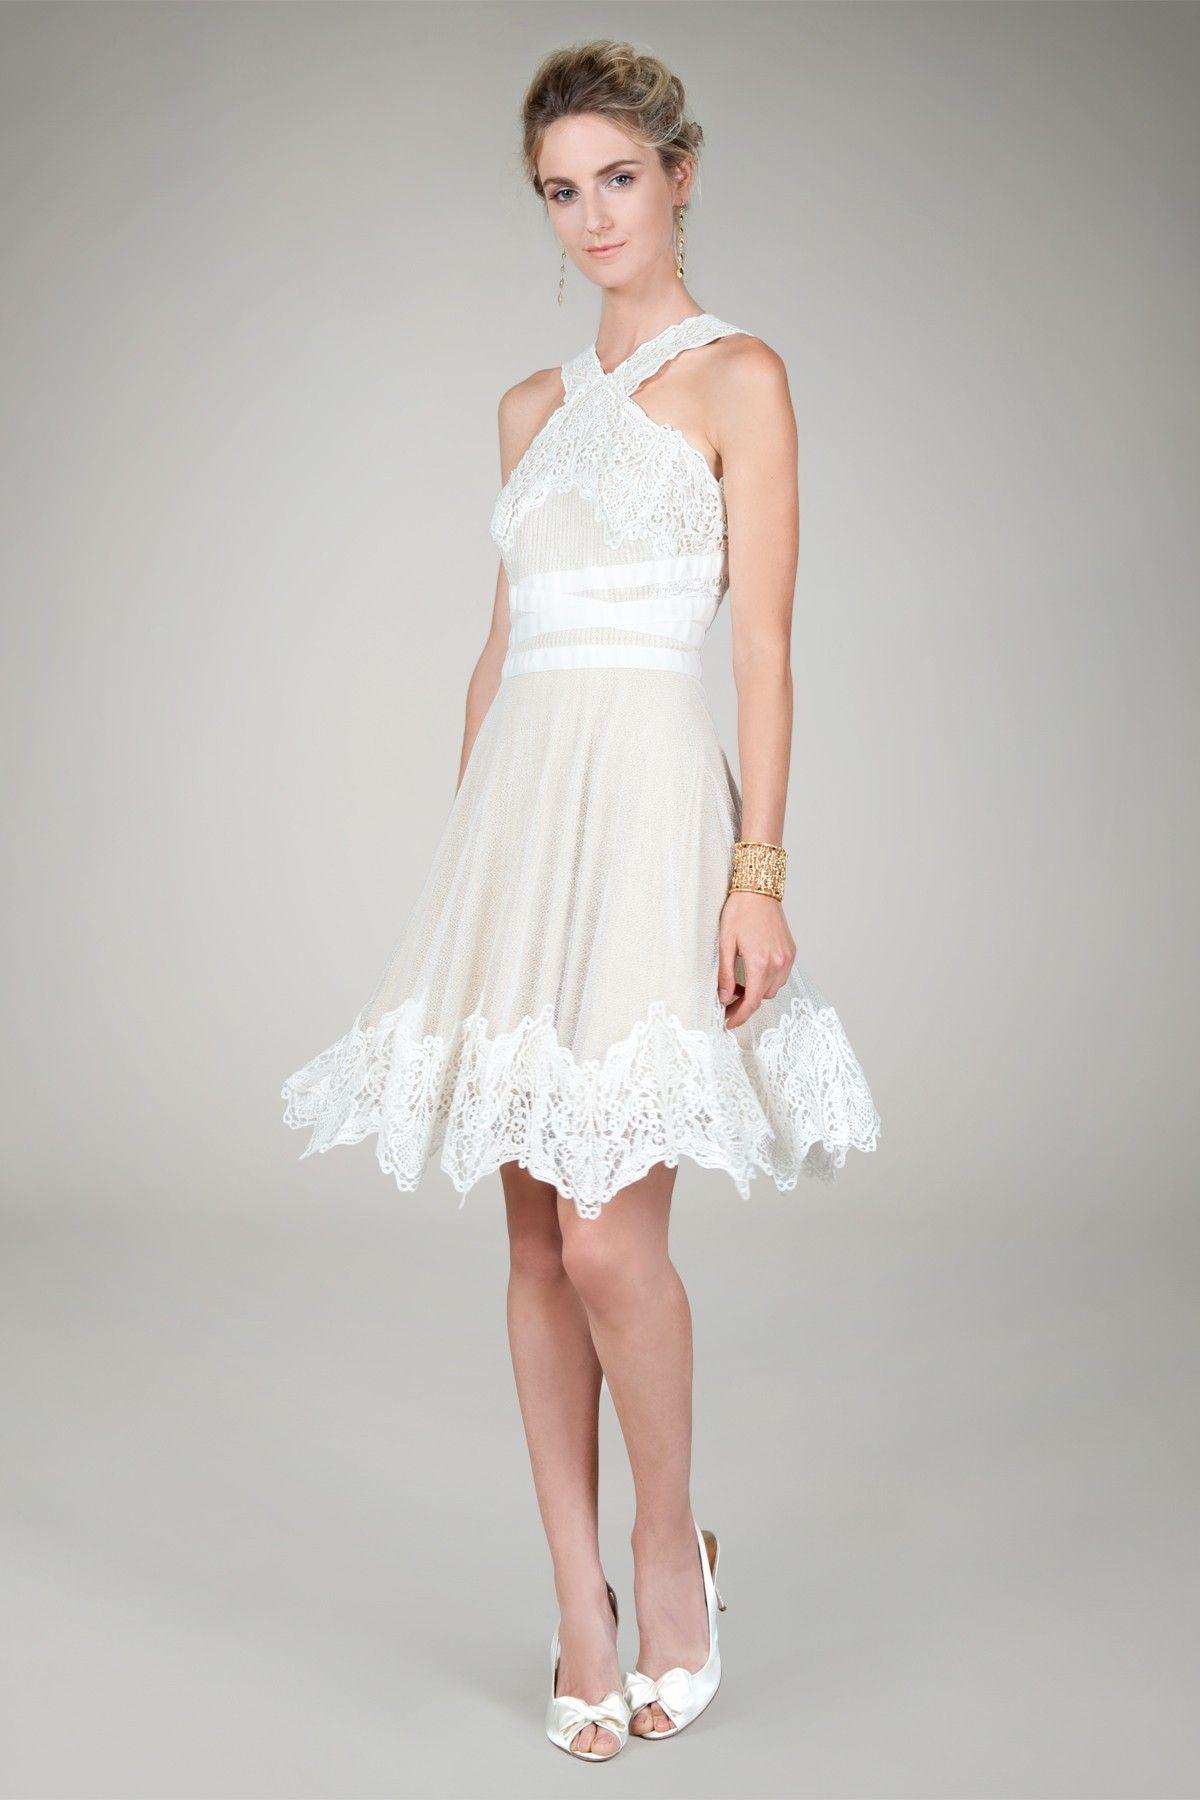 Long wedding reception dresses for the bride  Tadashi Shoji  Adrienneus Wedding  Pinterest  Bridal suite